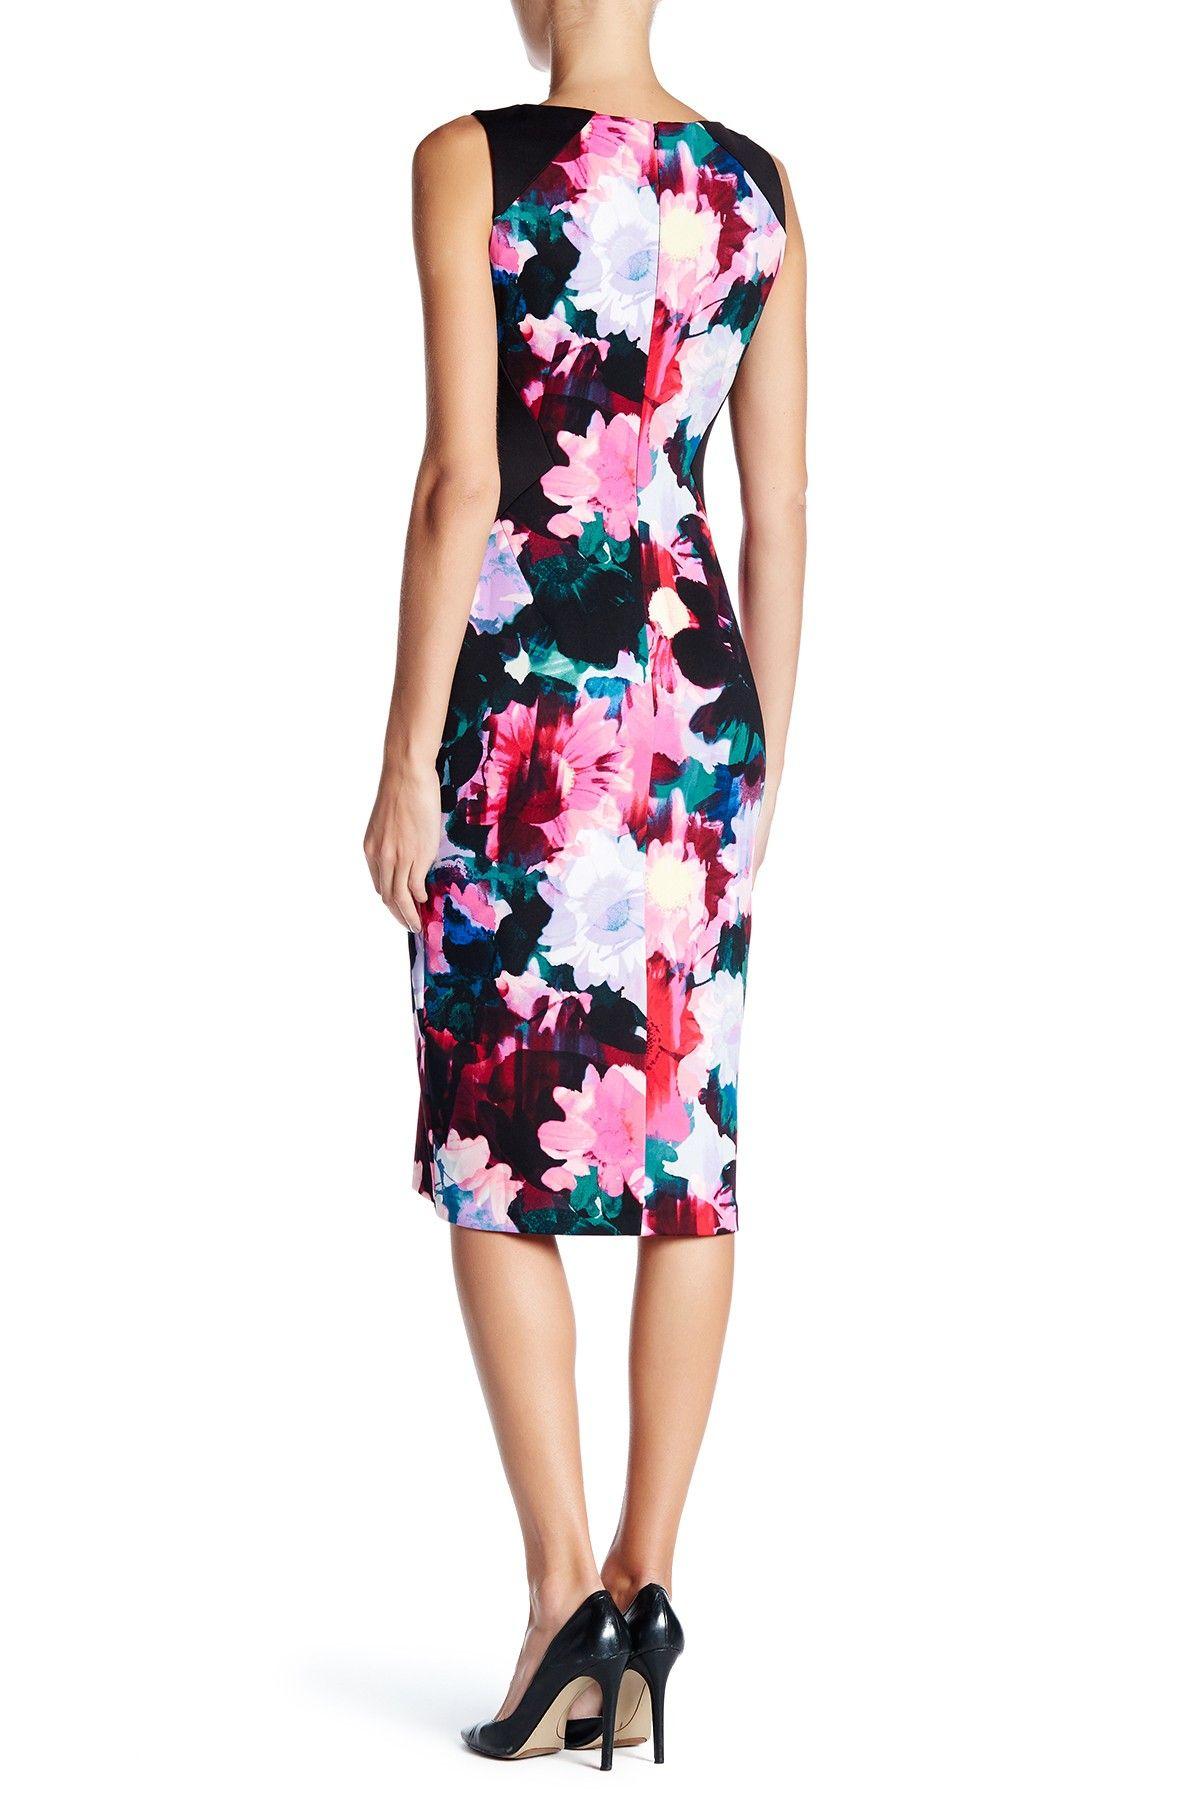 Floral Scuba Midi Dress Nony Pinterest Scubas Midi Dresses